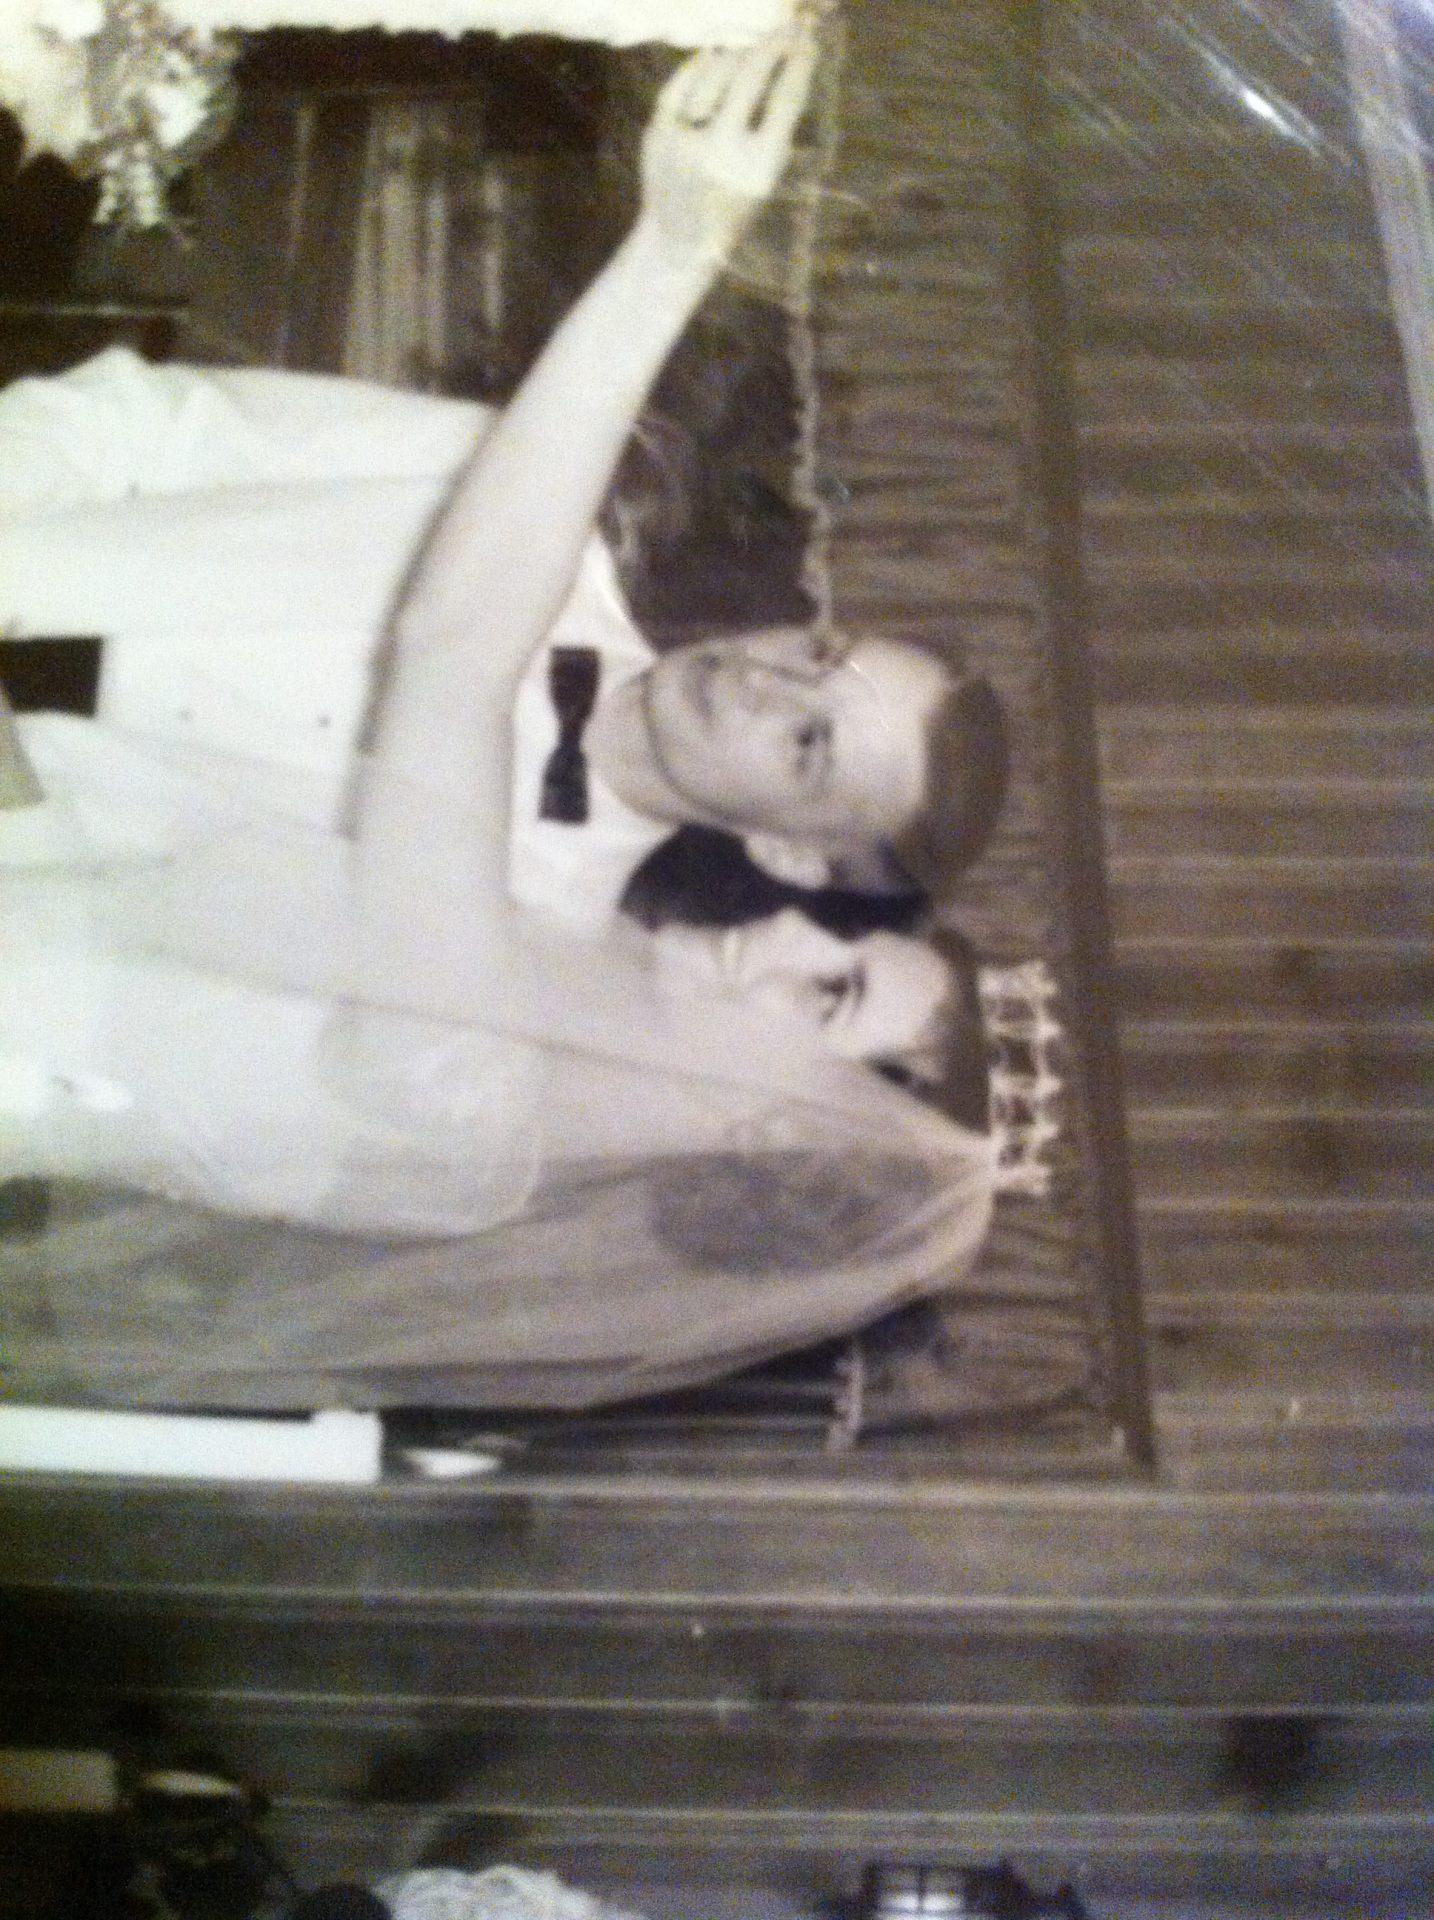 Sonia and Bob's wedding 1960